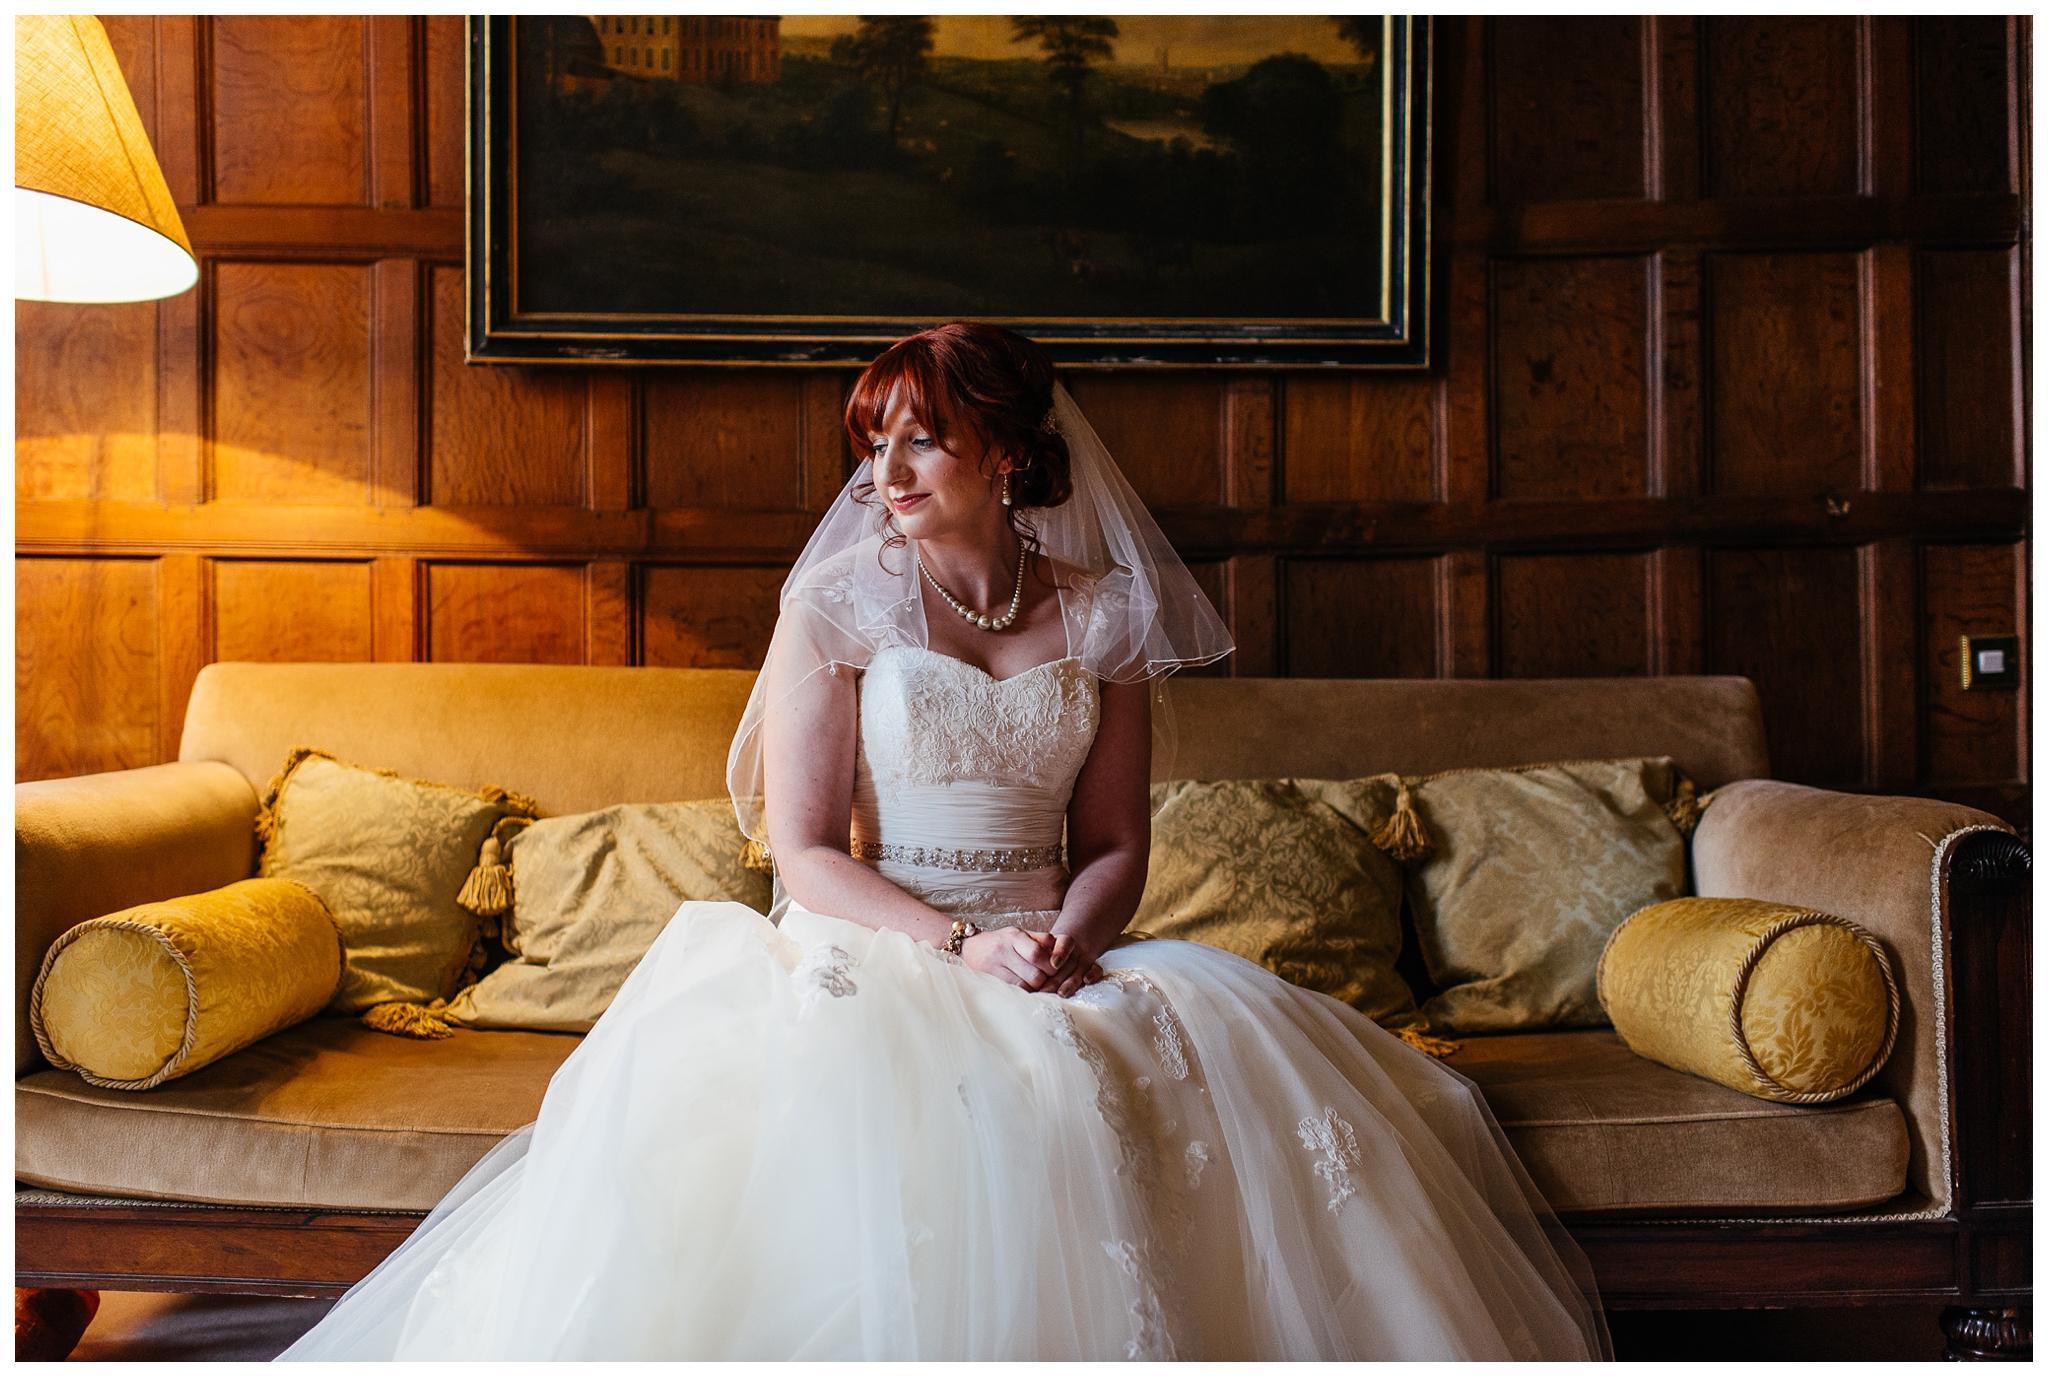 Emma&Paul-Elmore-Court-Winter-Wedding-Nikki-Cooper-Photography_0041.jpg